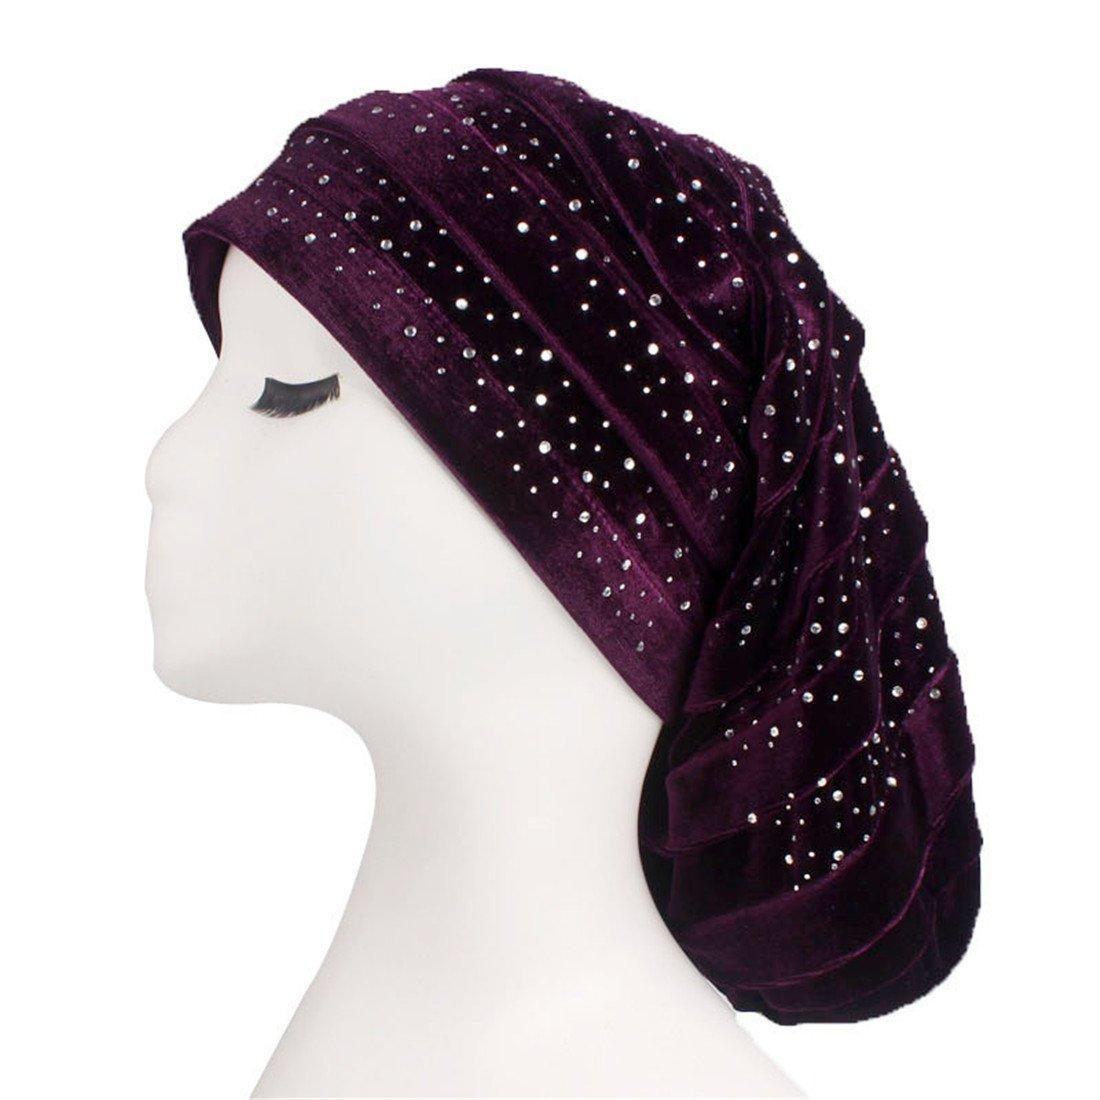 Qhome Diamante Velvet Ruffle Turban Dreadlock Sleeping Cap Baggy Hat for Hair Loss Women Headwrap Slouch Caps Headwear Hijabs